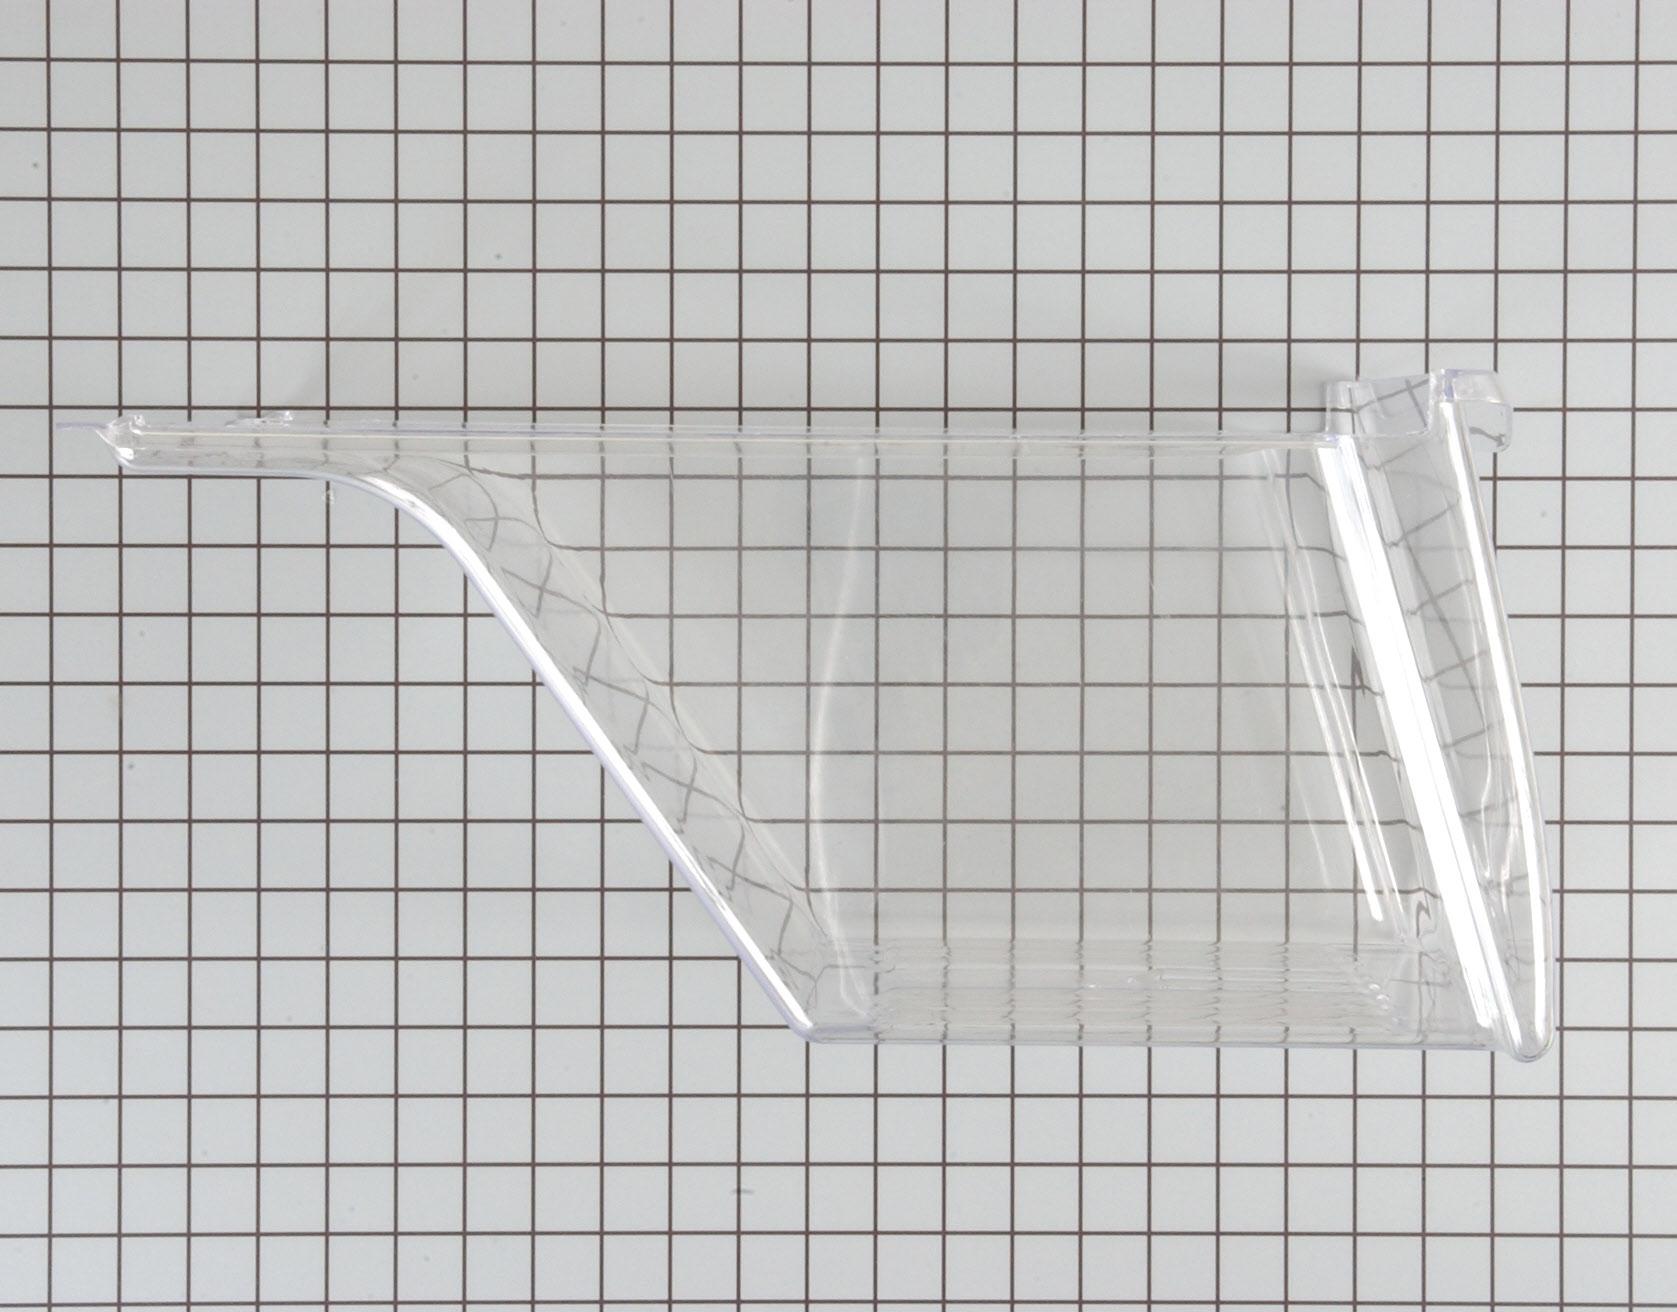 Kenmore Refrigerator Part # 240337103 - Crisper Drawer